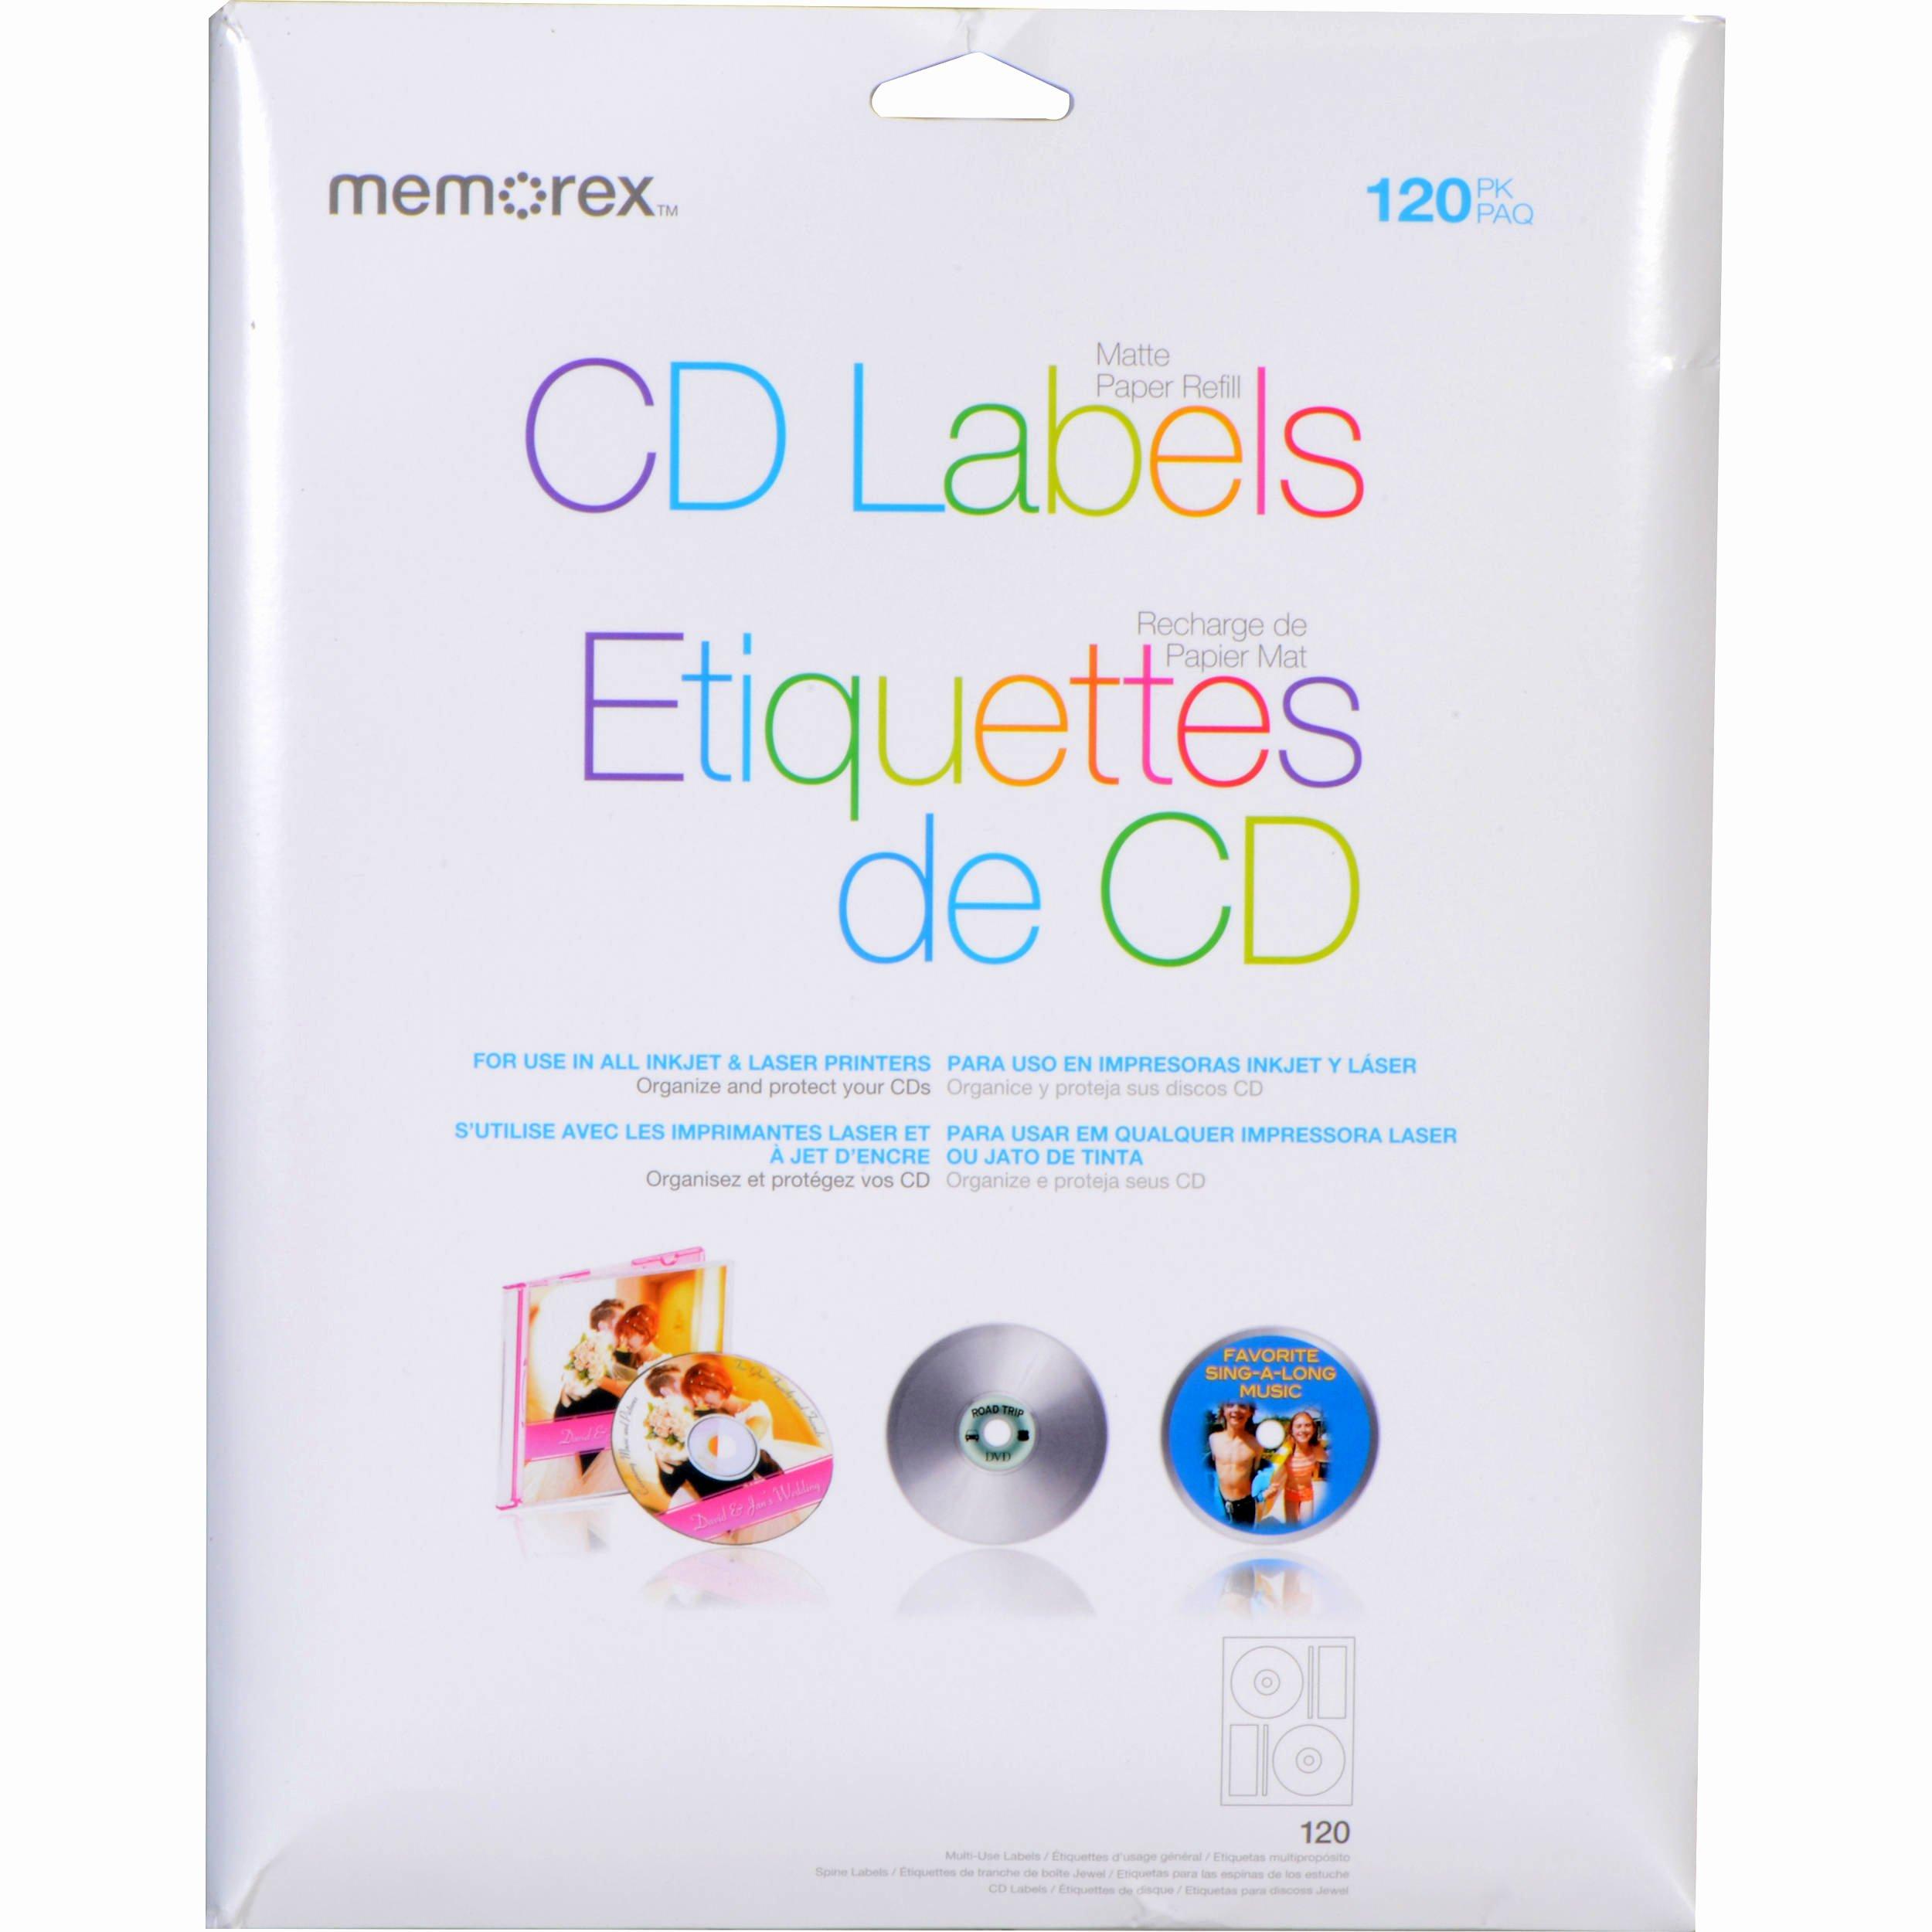 Memorex Cd Labelmaker Template Unique Blog Archives Programsbackuper